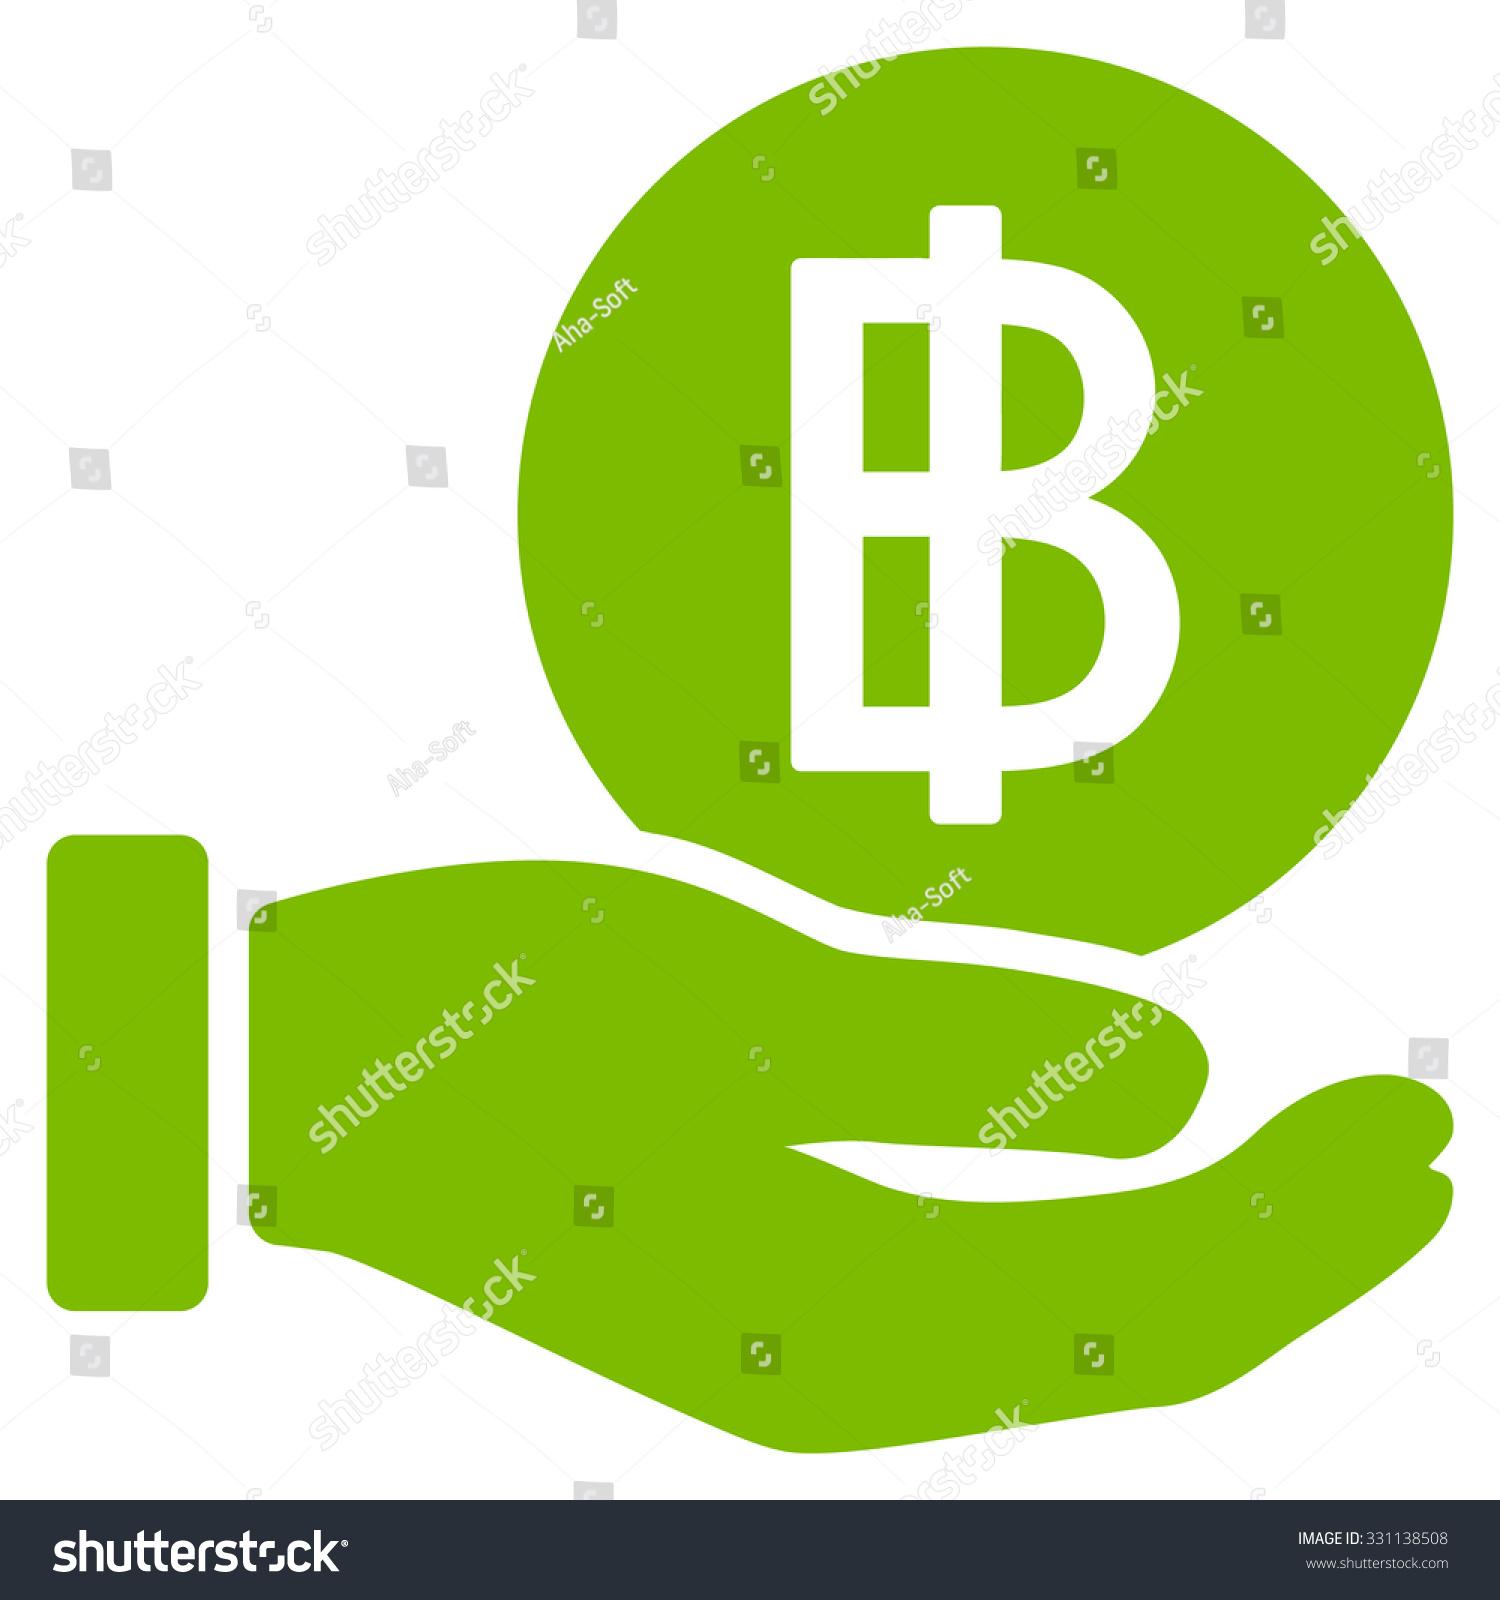 Thai Baht Coin Payment Vector Icon Stock Vector Royalty Free